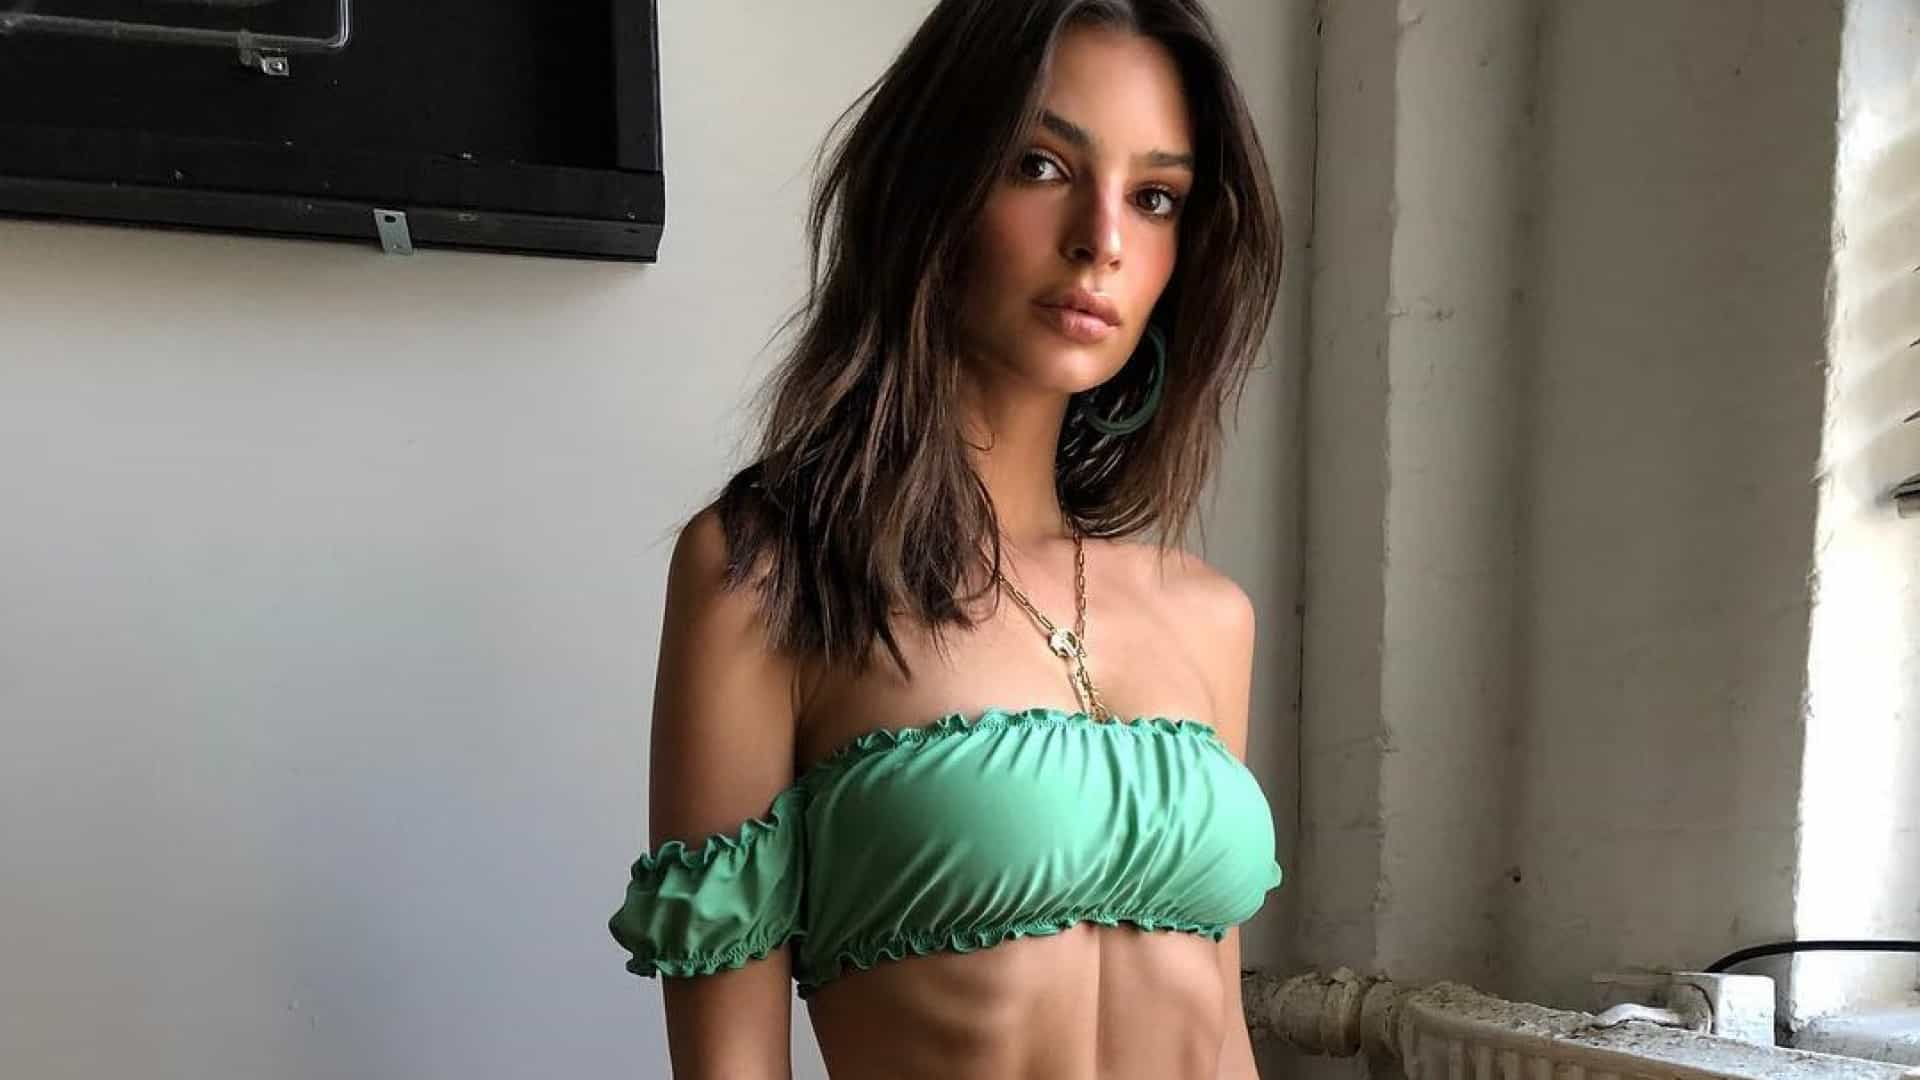 Magreza de Emily Ratajkowski impressiona fãs